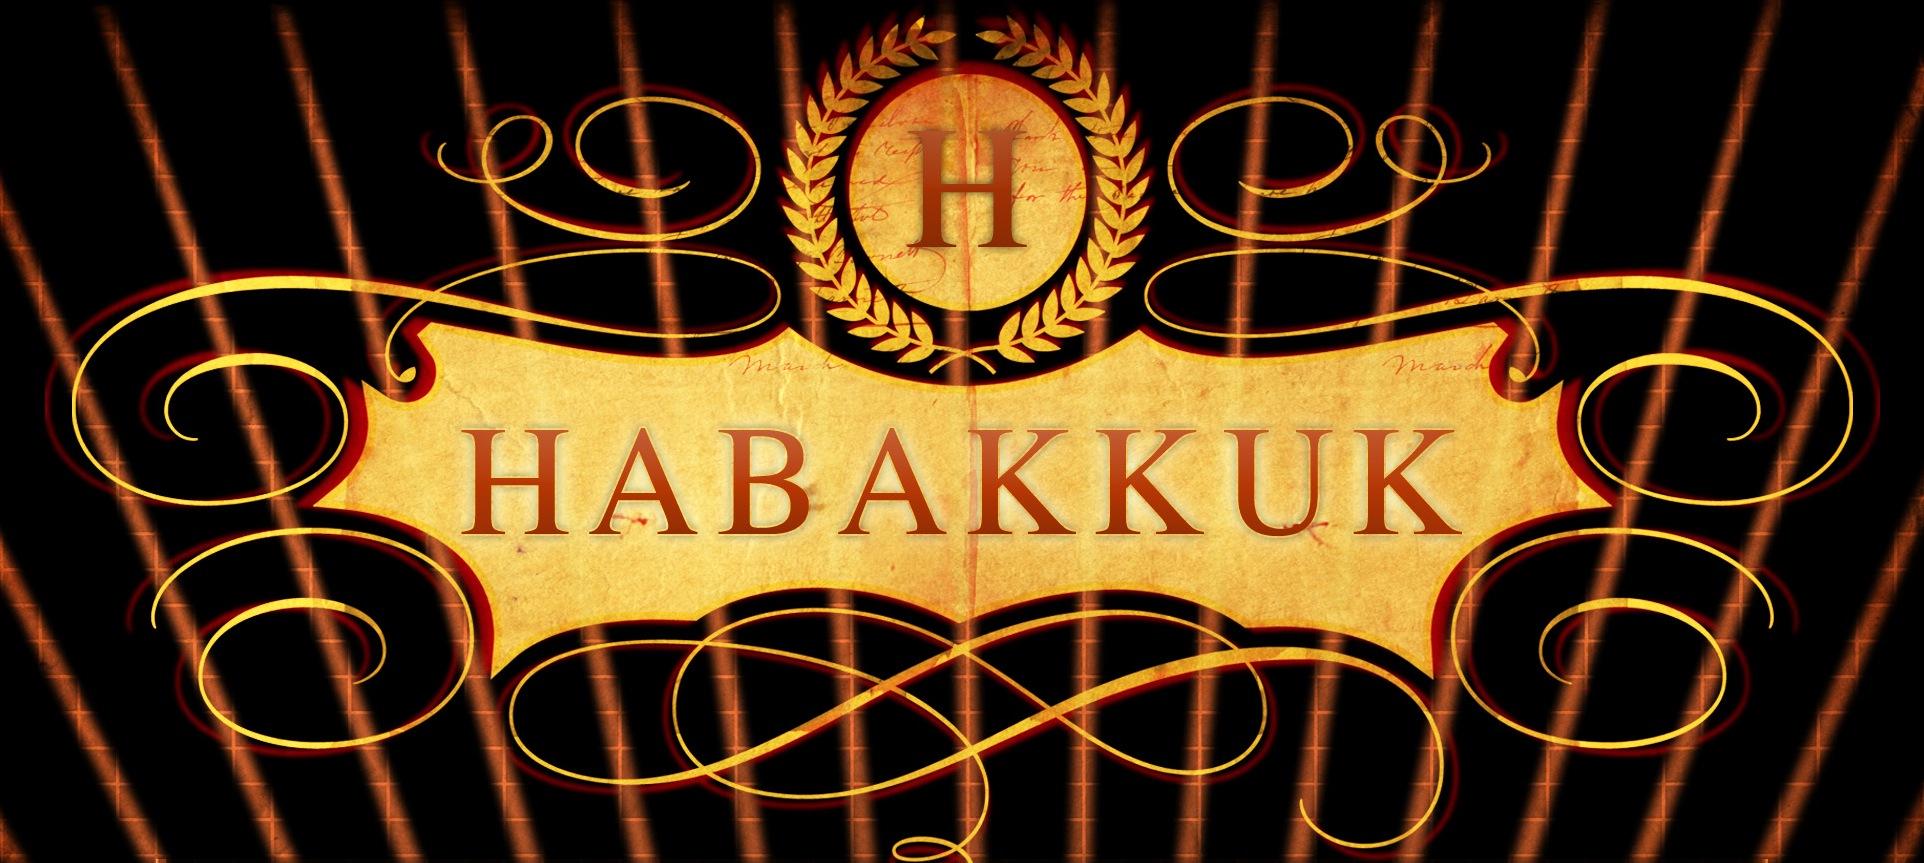 habakkuk_wide_t_nv